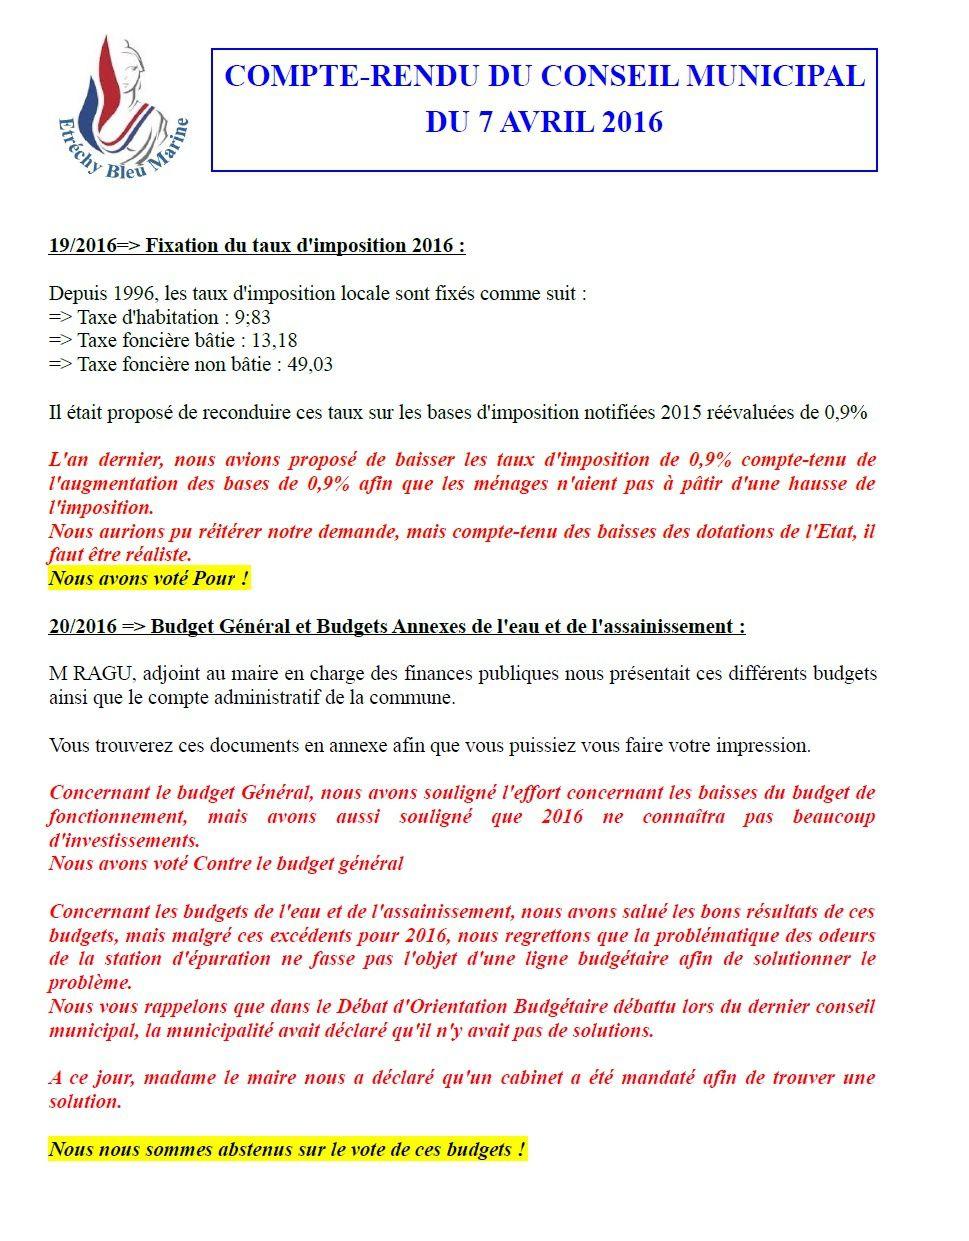 Compte-Rendu du conseil municipal du 7 avril 2016